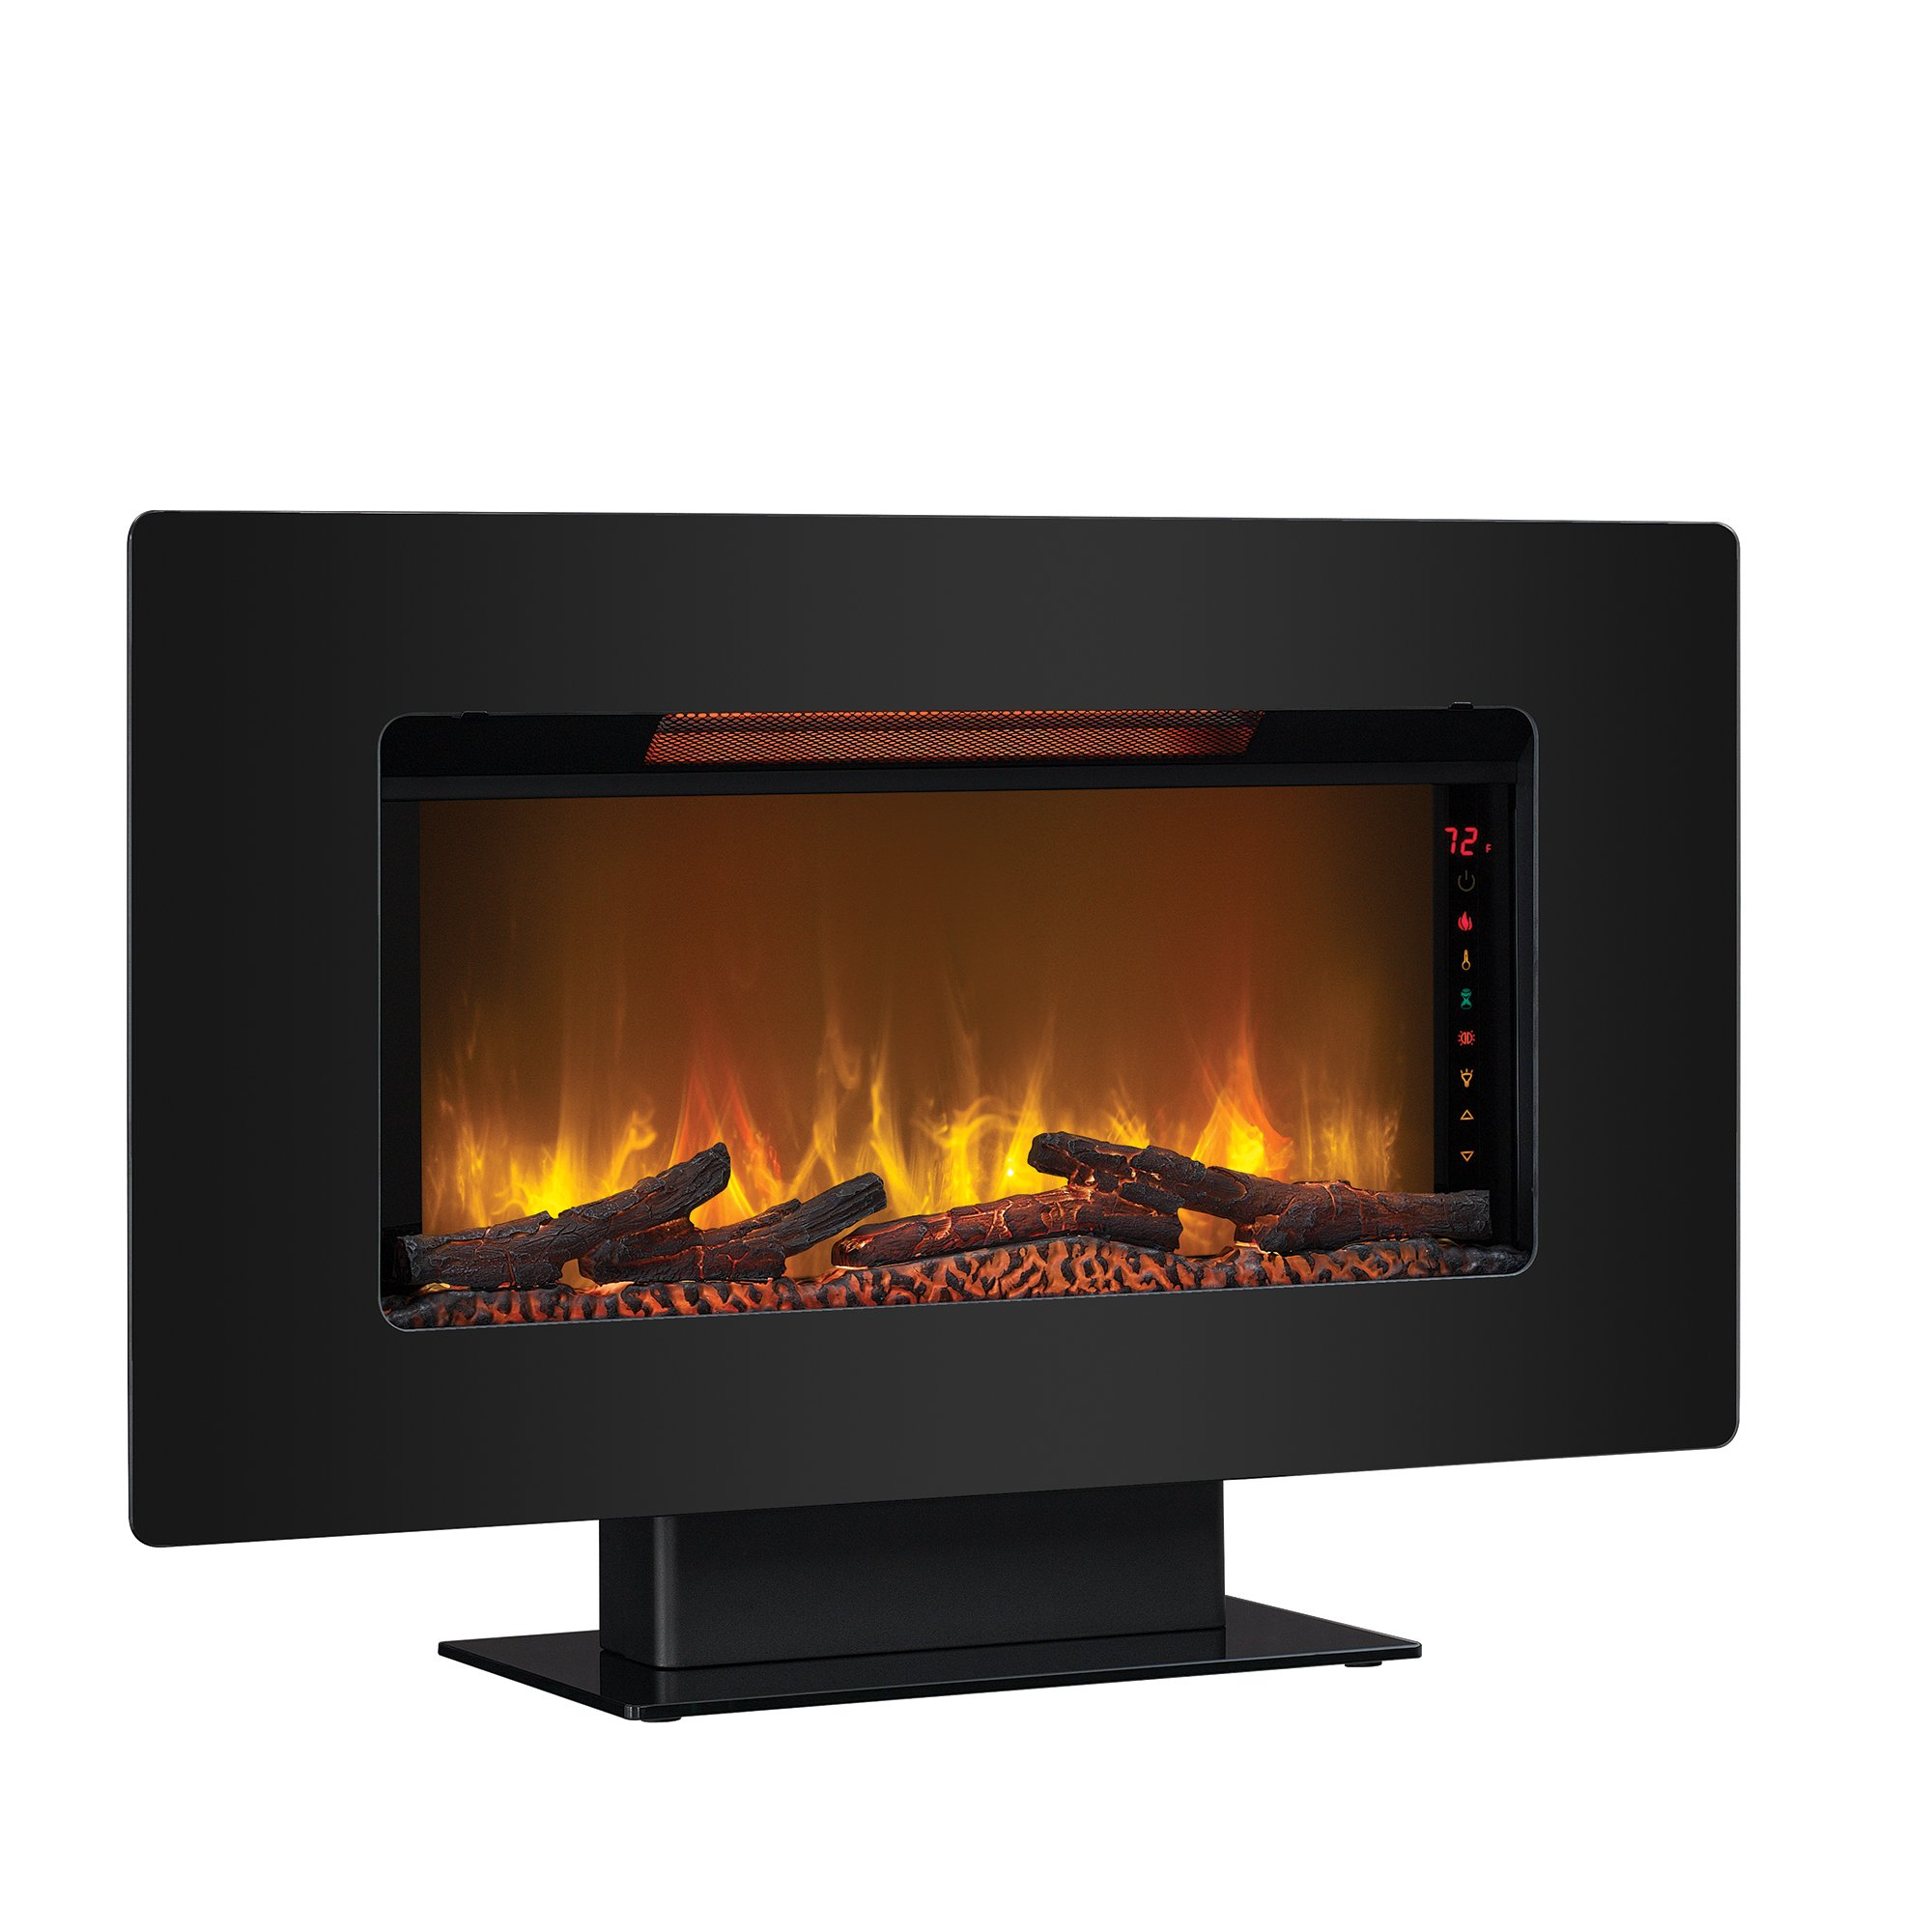 wall mount gas fireplace amazon com rh amazon com flat wall mount gas fireplace flat gas fireplace logs